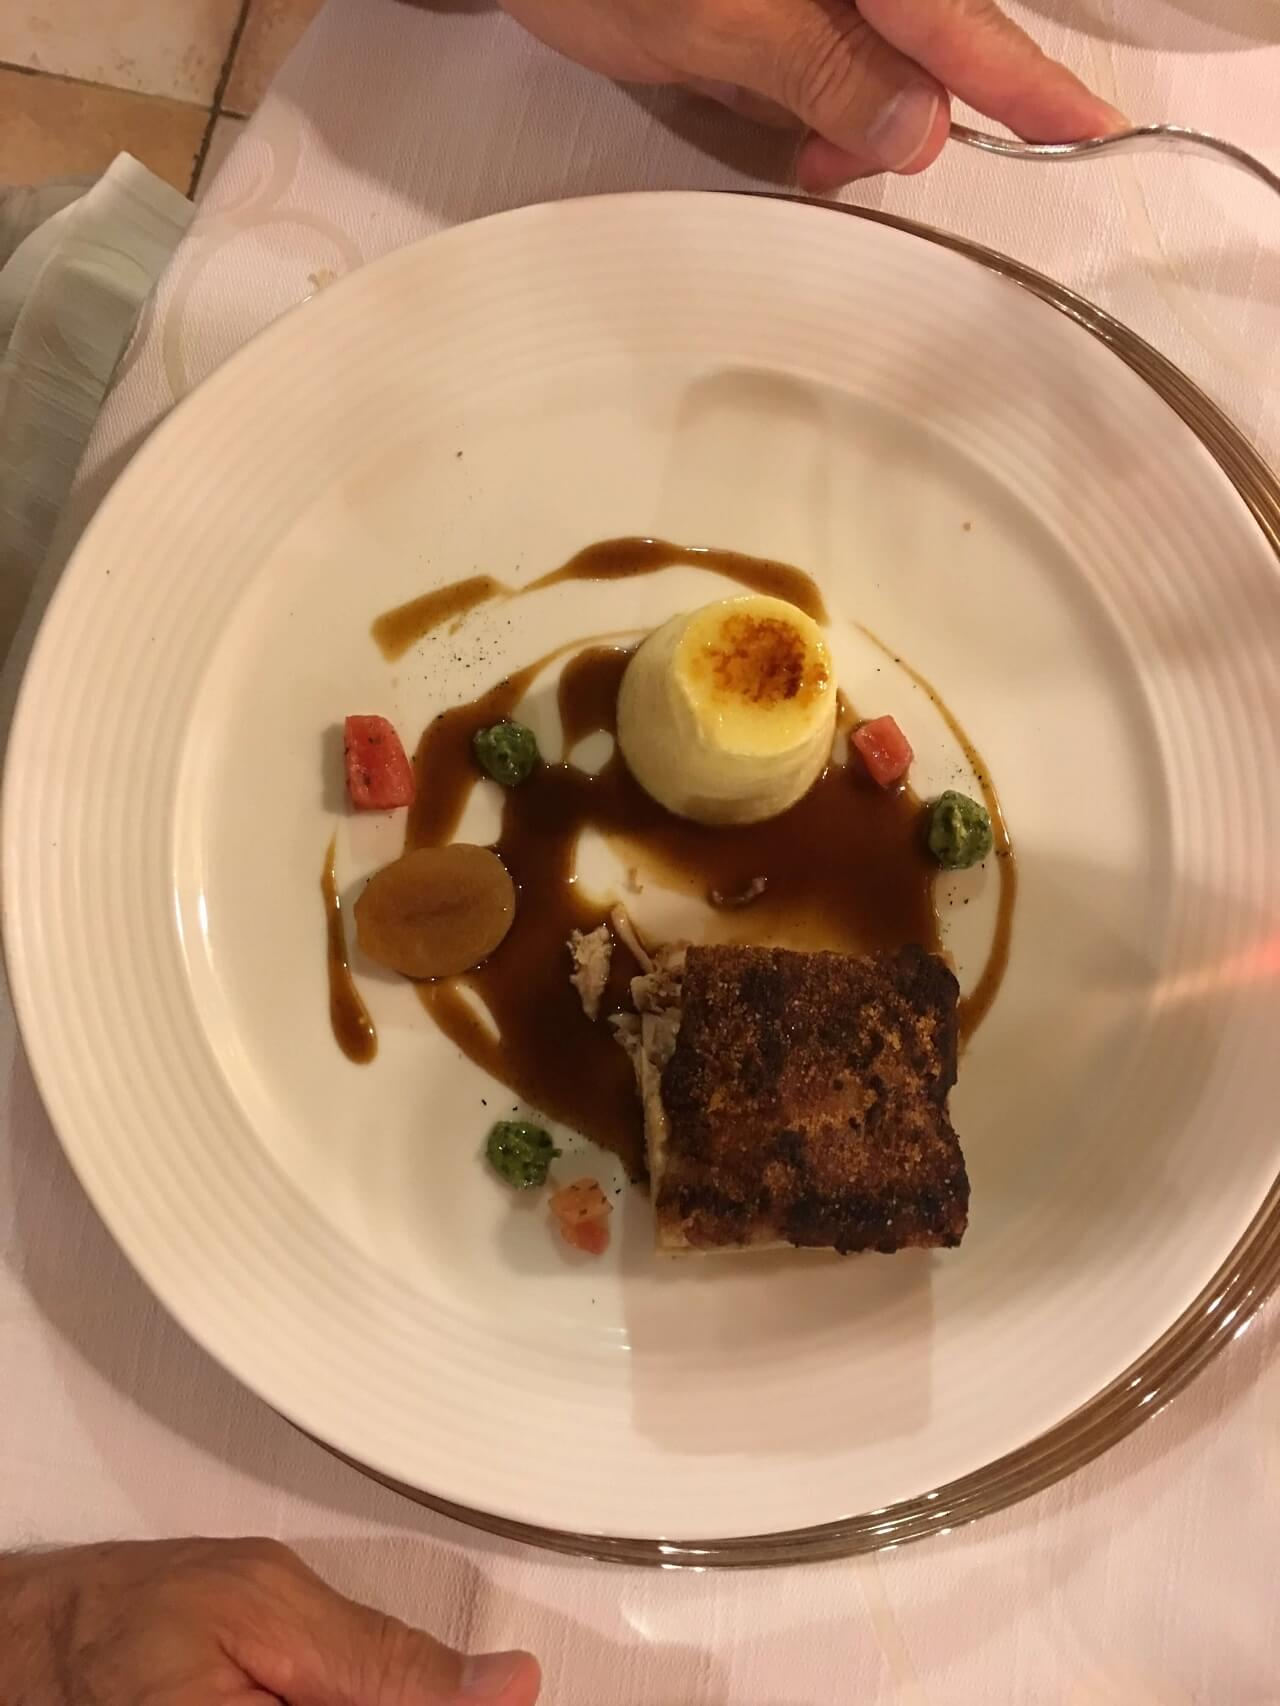 Beef with polenta, a Taormina specialty